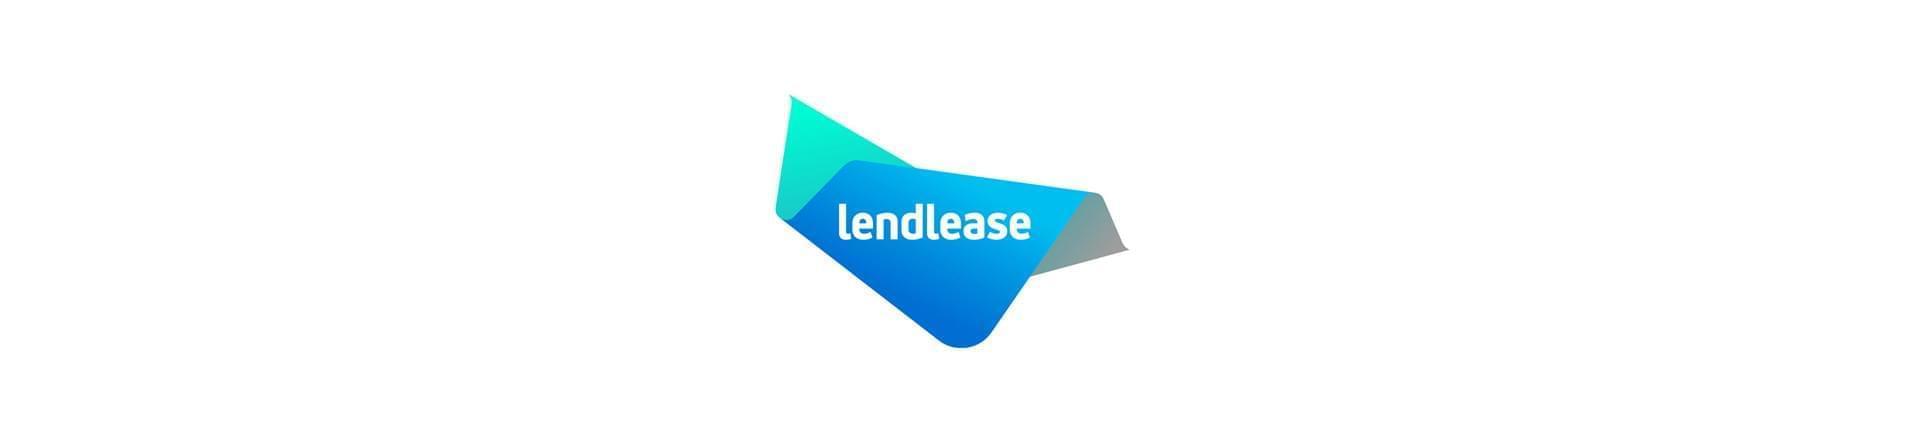 Lendlease logo  | #aplaceforme at Lendlease - Empowering Employees